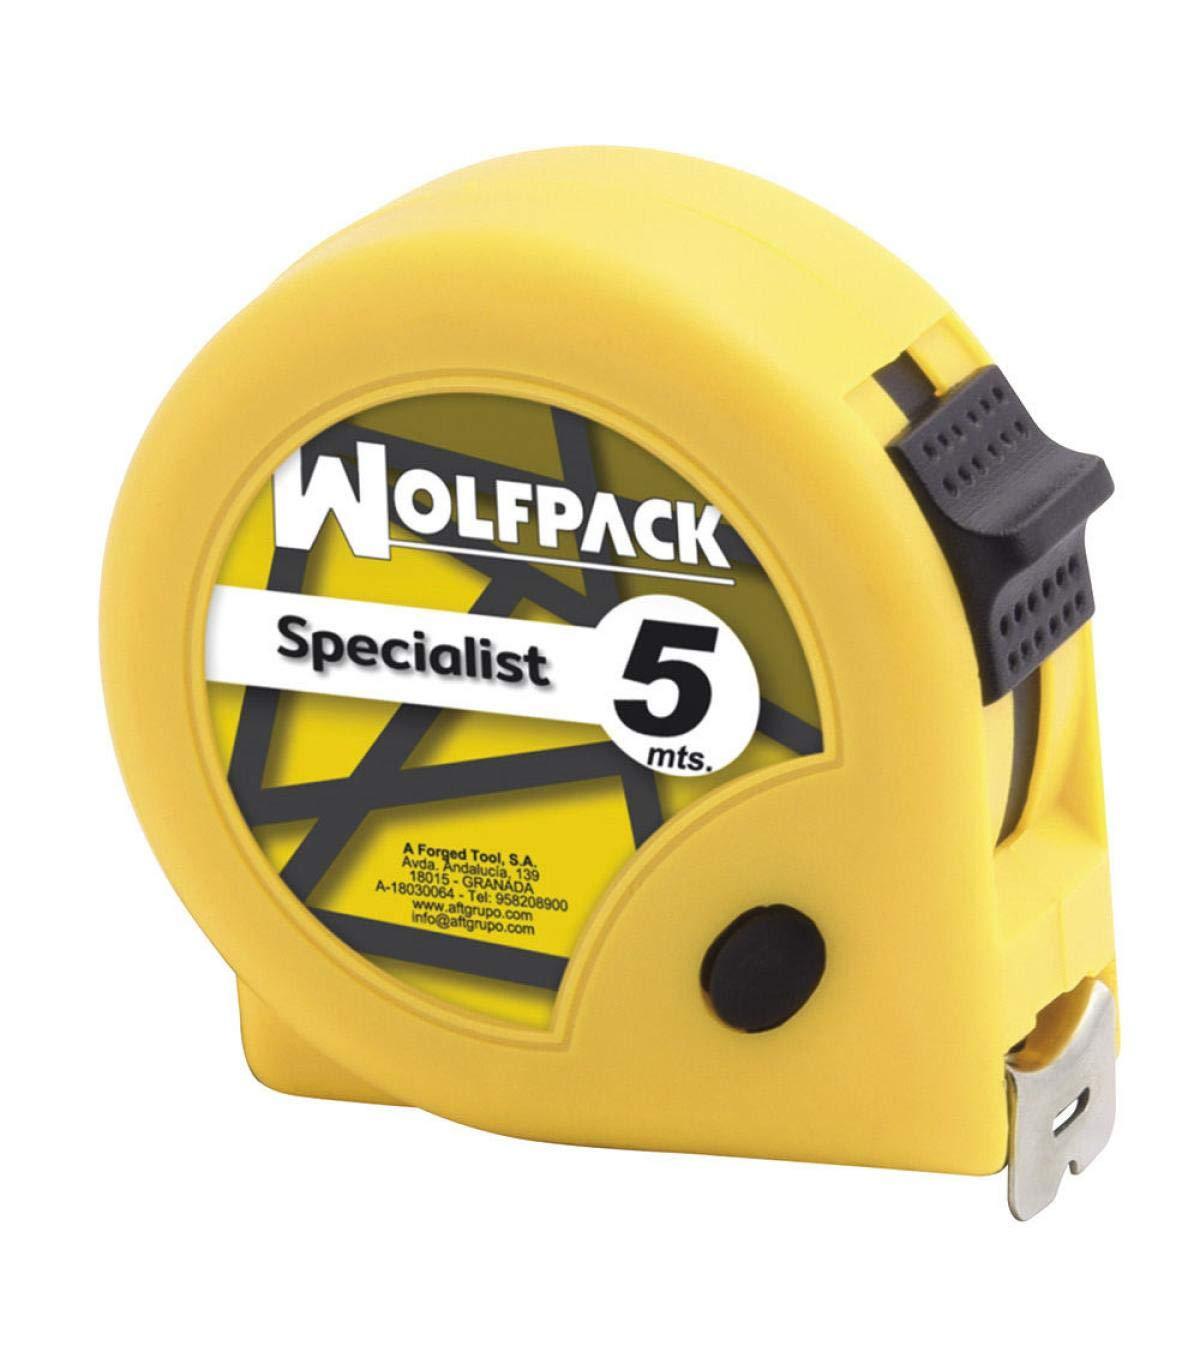 Wolfpack 2300510 Flexometro Speciallist Sin Freno 5 Metros 19 mm.